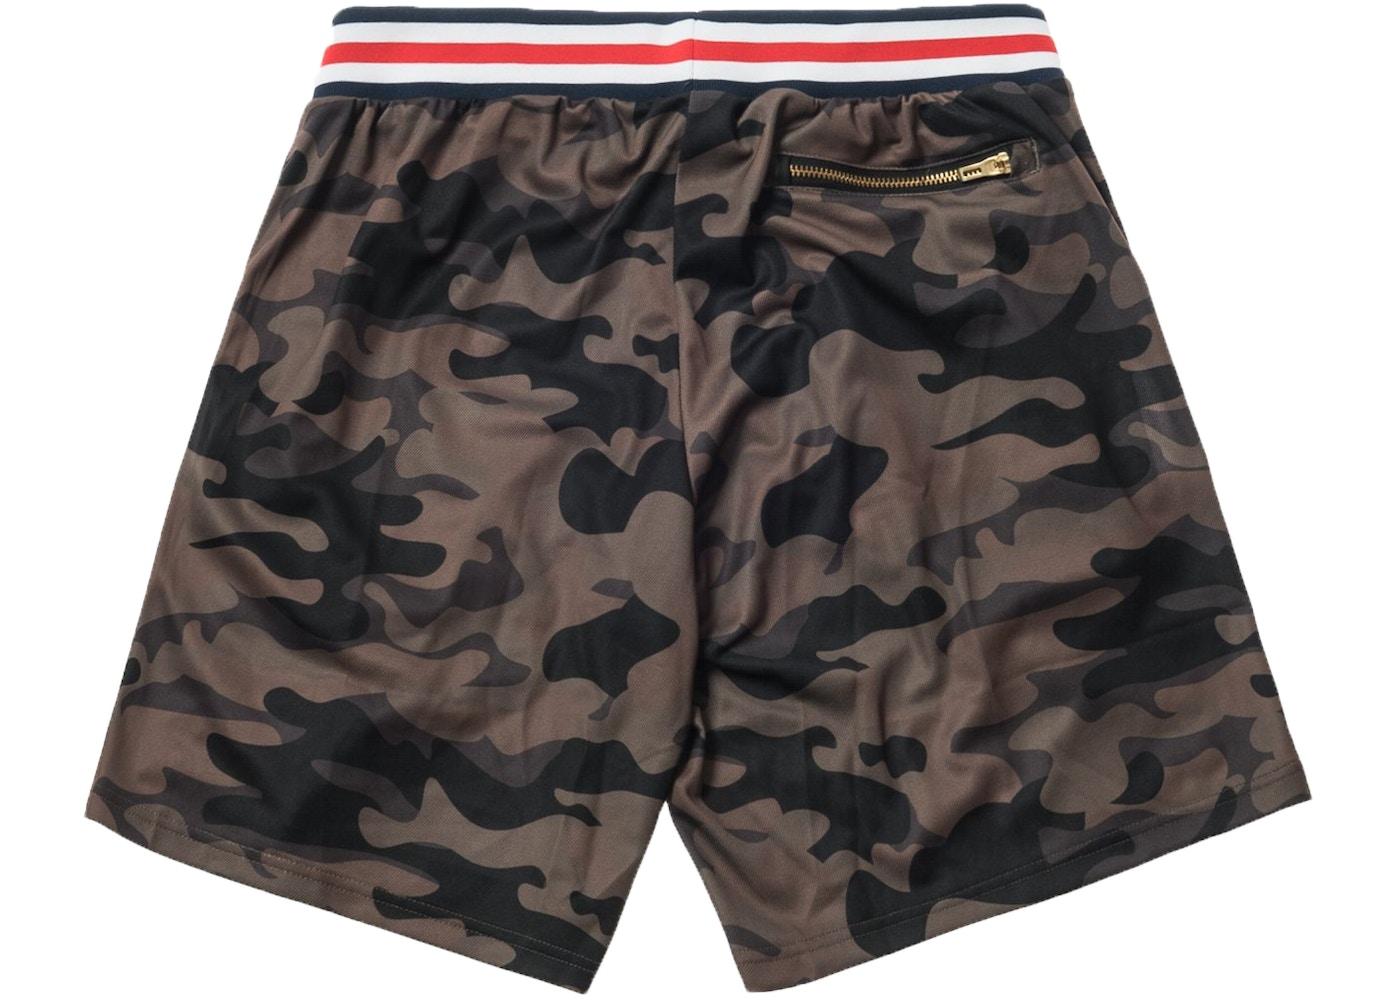 04912e57 Streetwear - Kith Bottoms - Lowest Ask